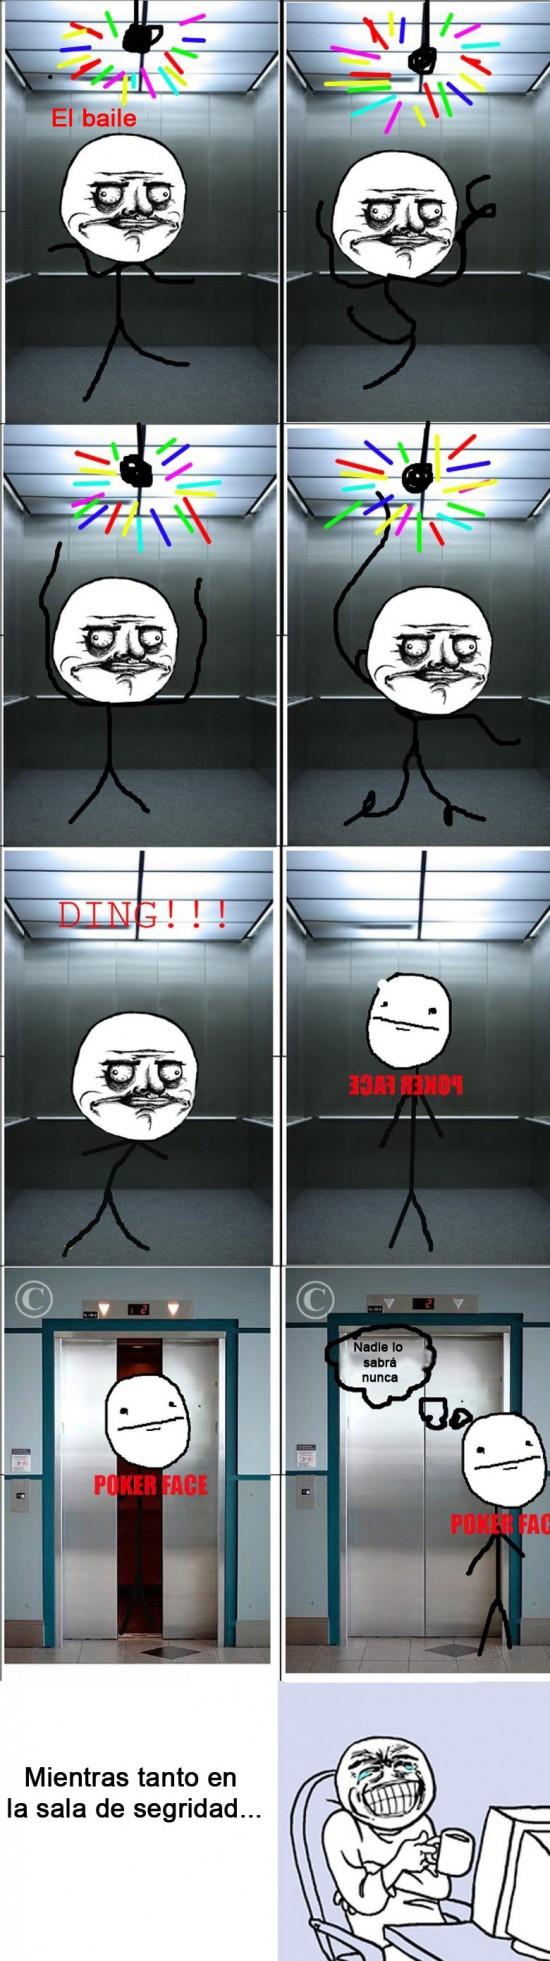 ascensor,Baile,solitario